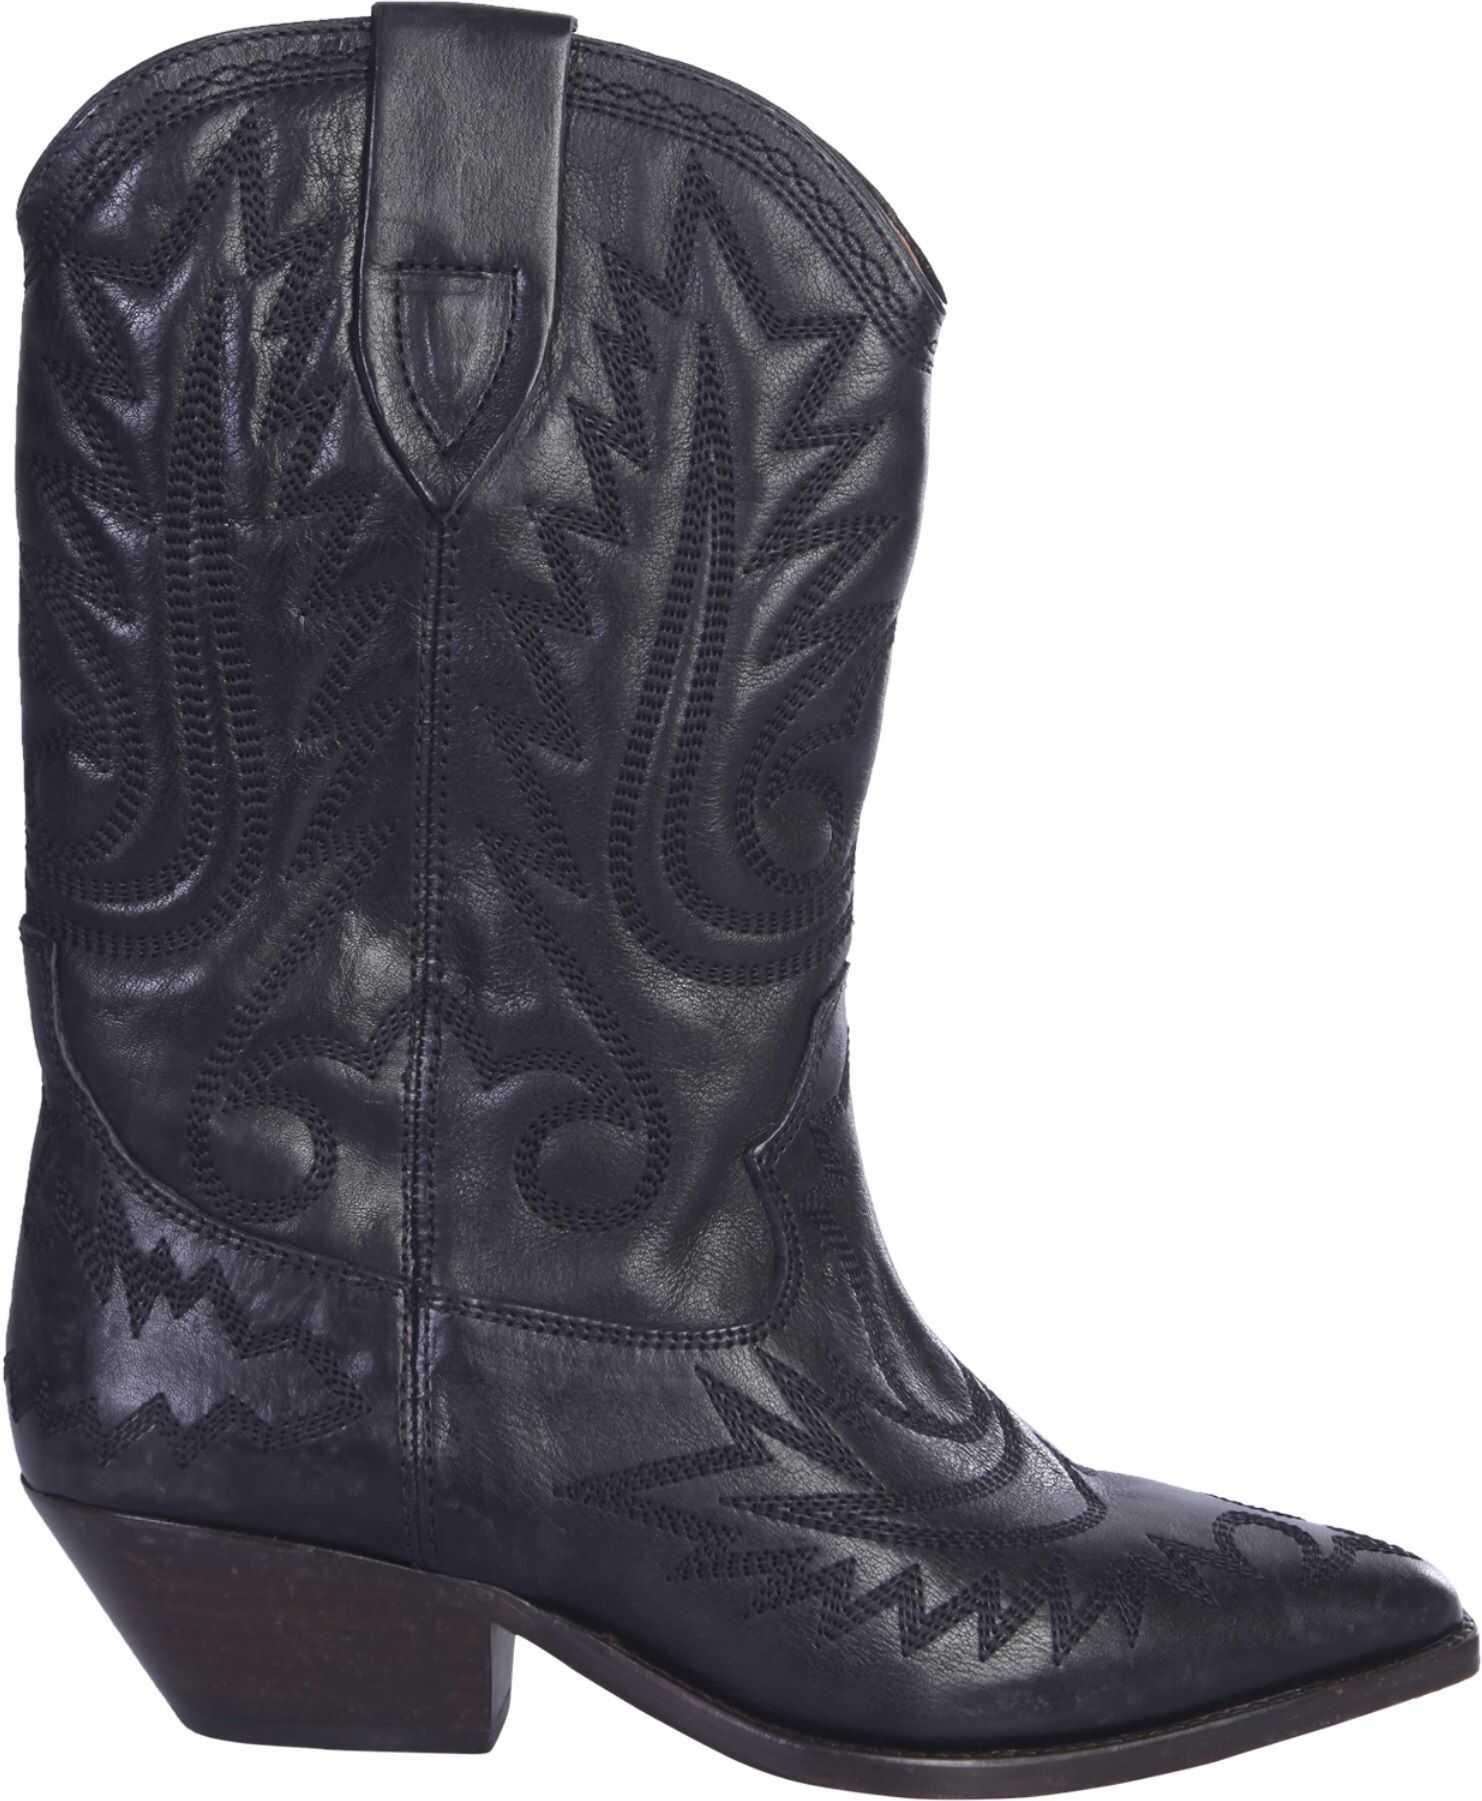 Isabel Marant Texan Duerto Boots BLACK